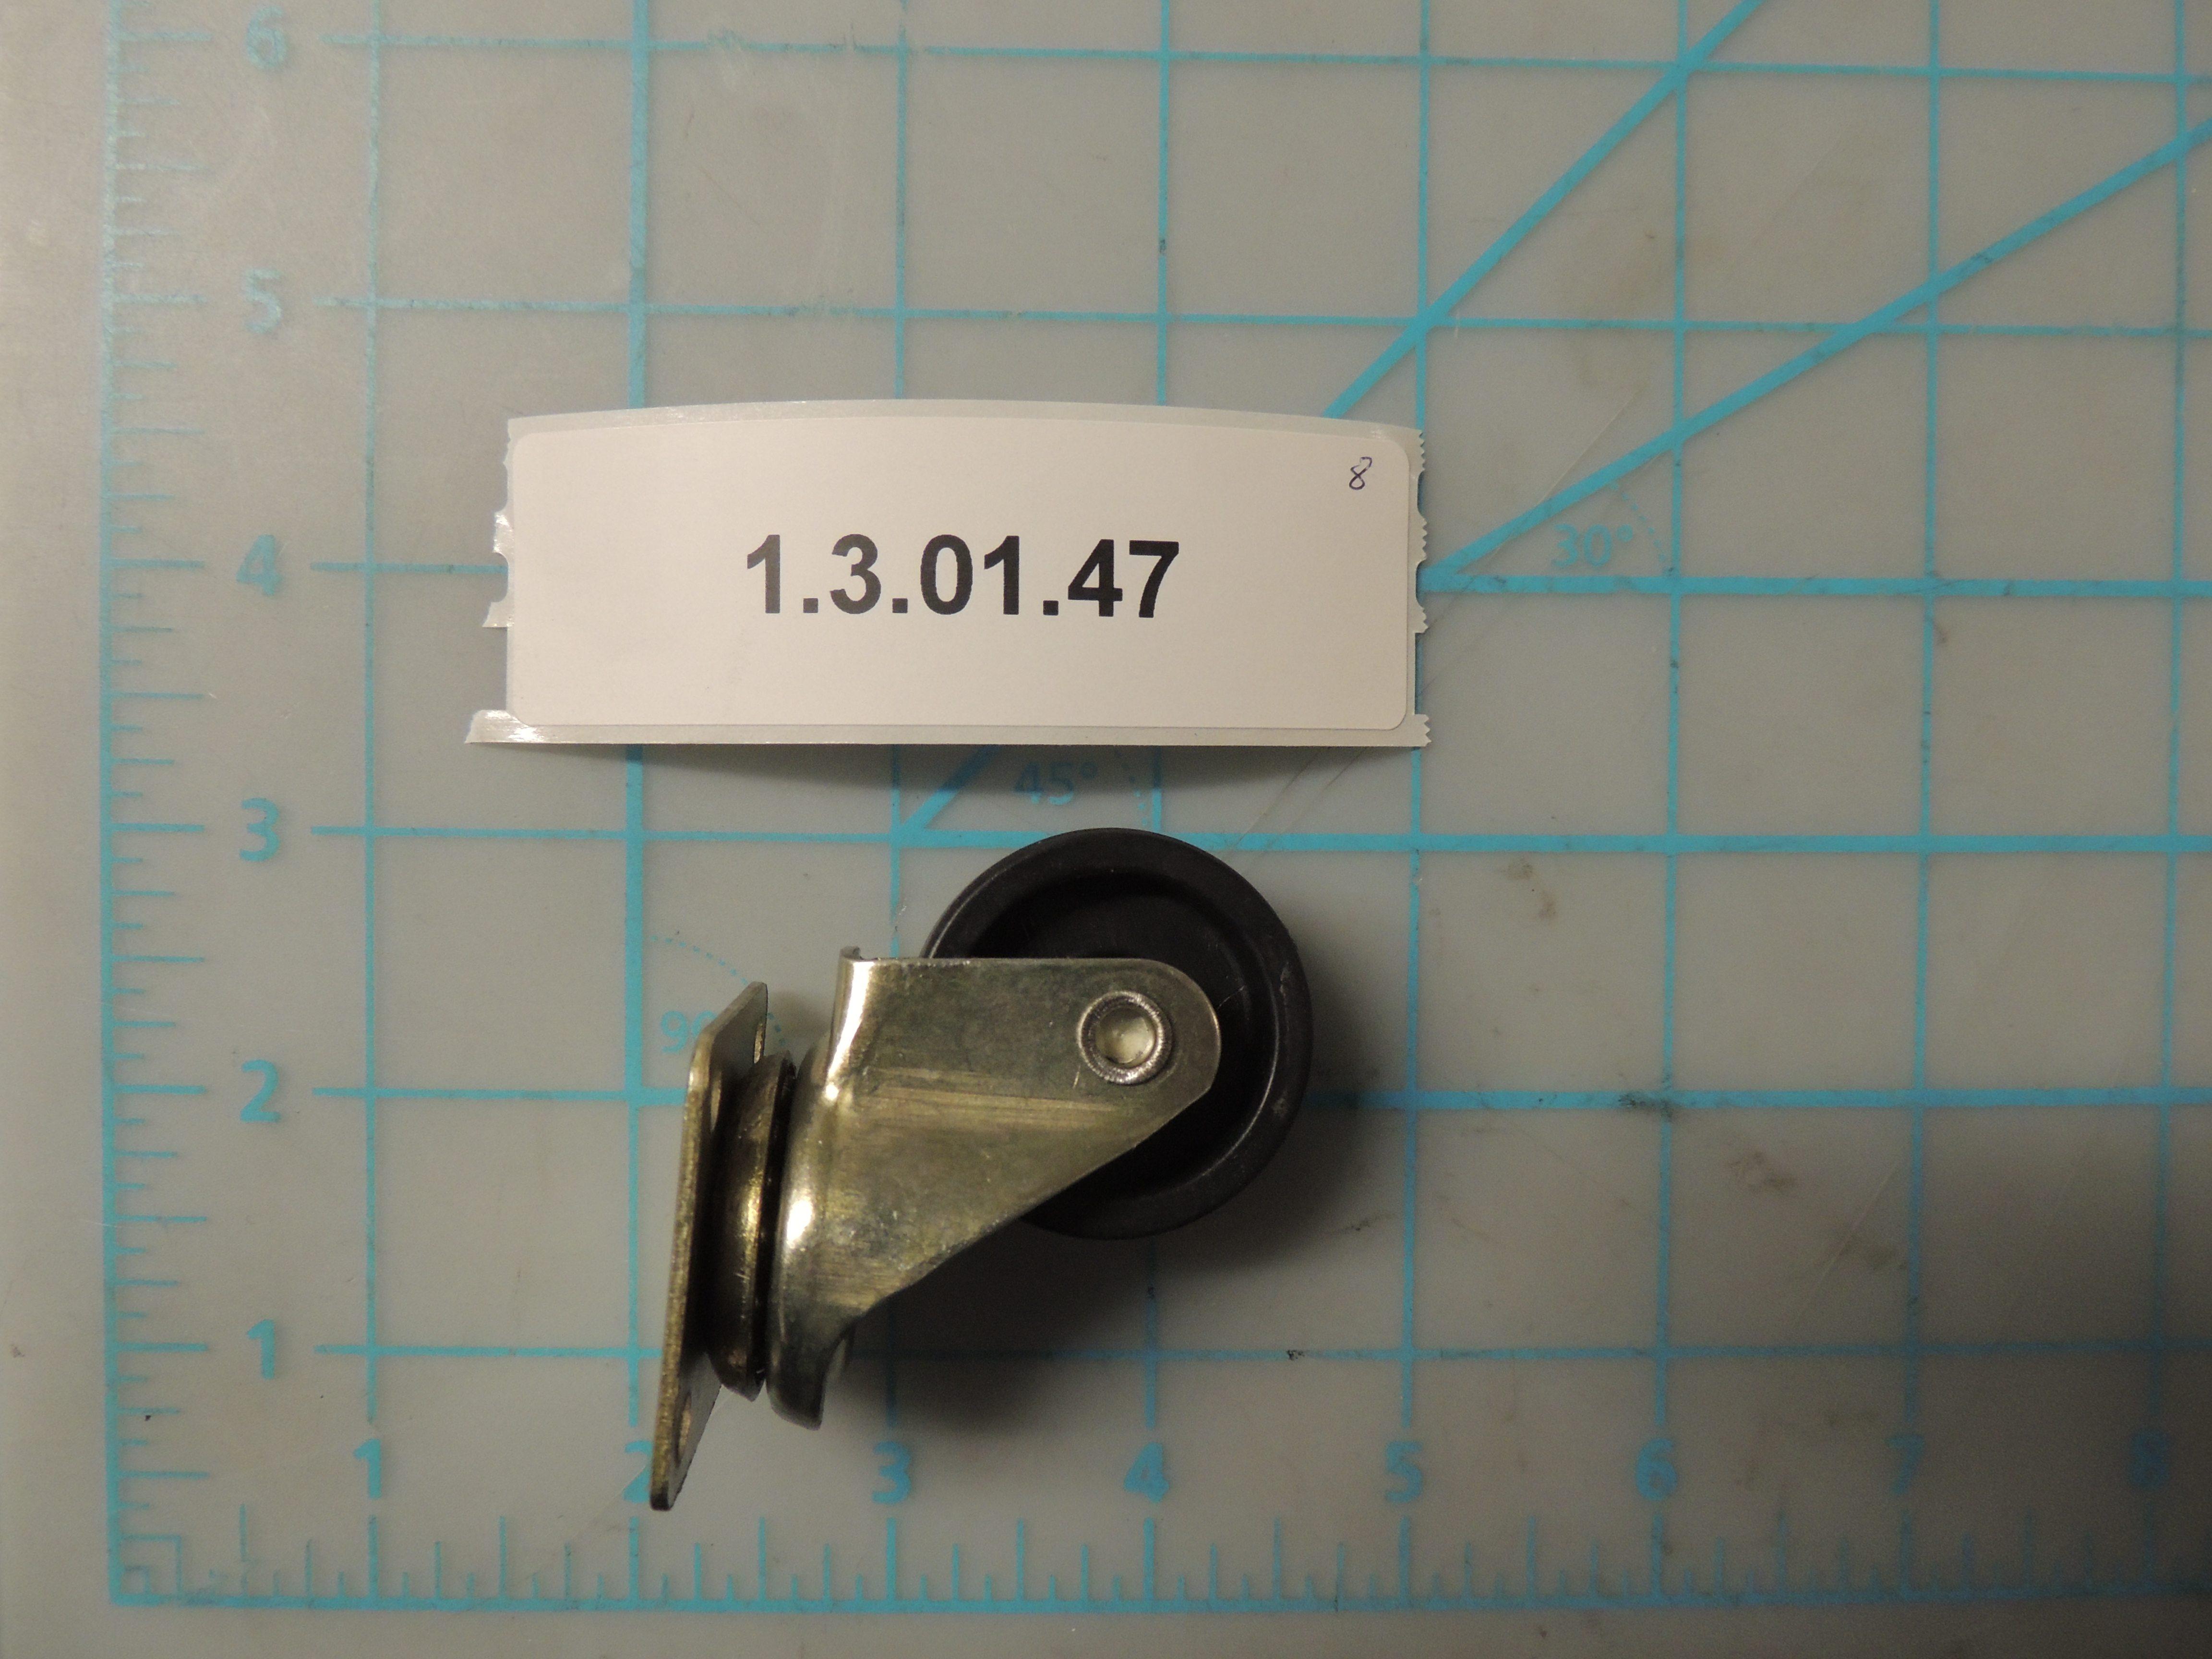 DPAC9030 UNIT CASTER